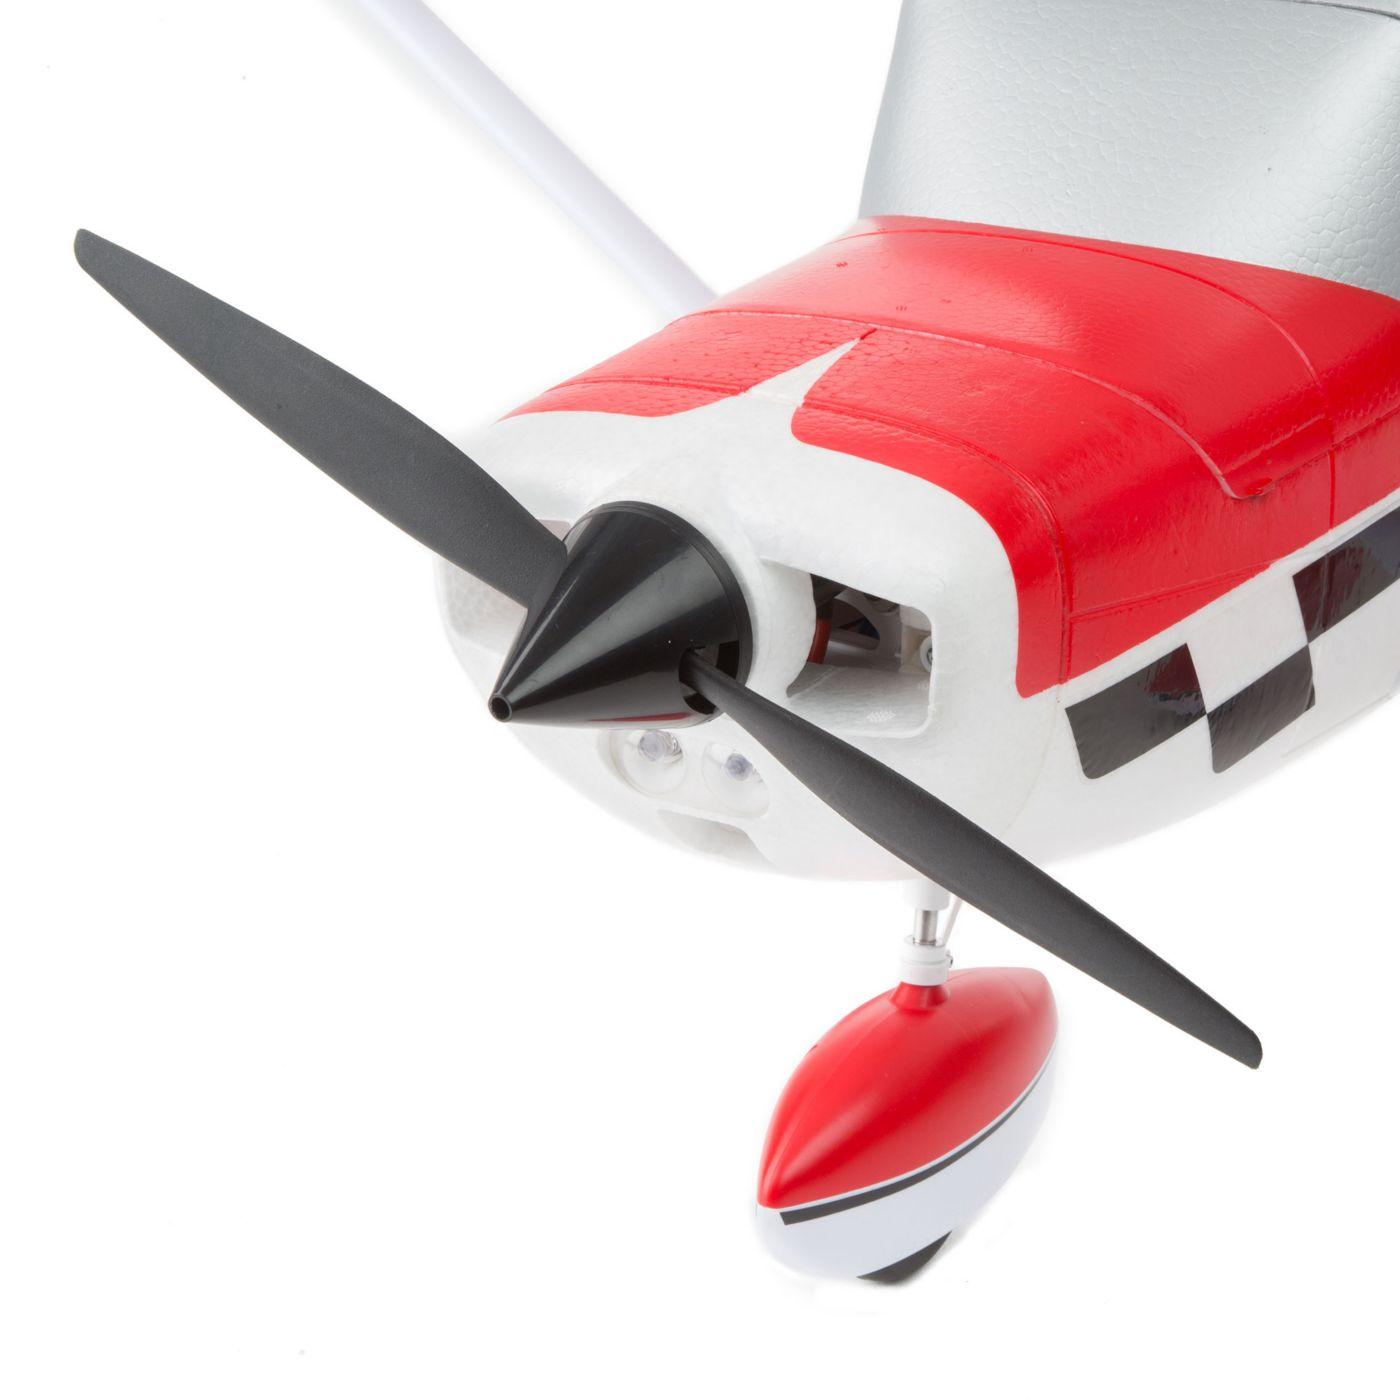 E-flite Carbon Z Cessna 150 2.1m BNF Basic 06